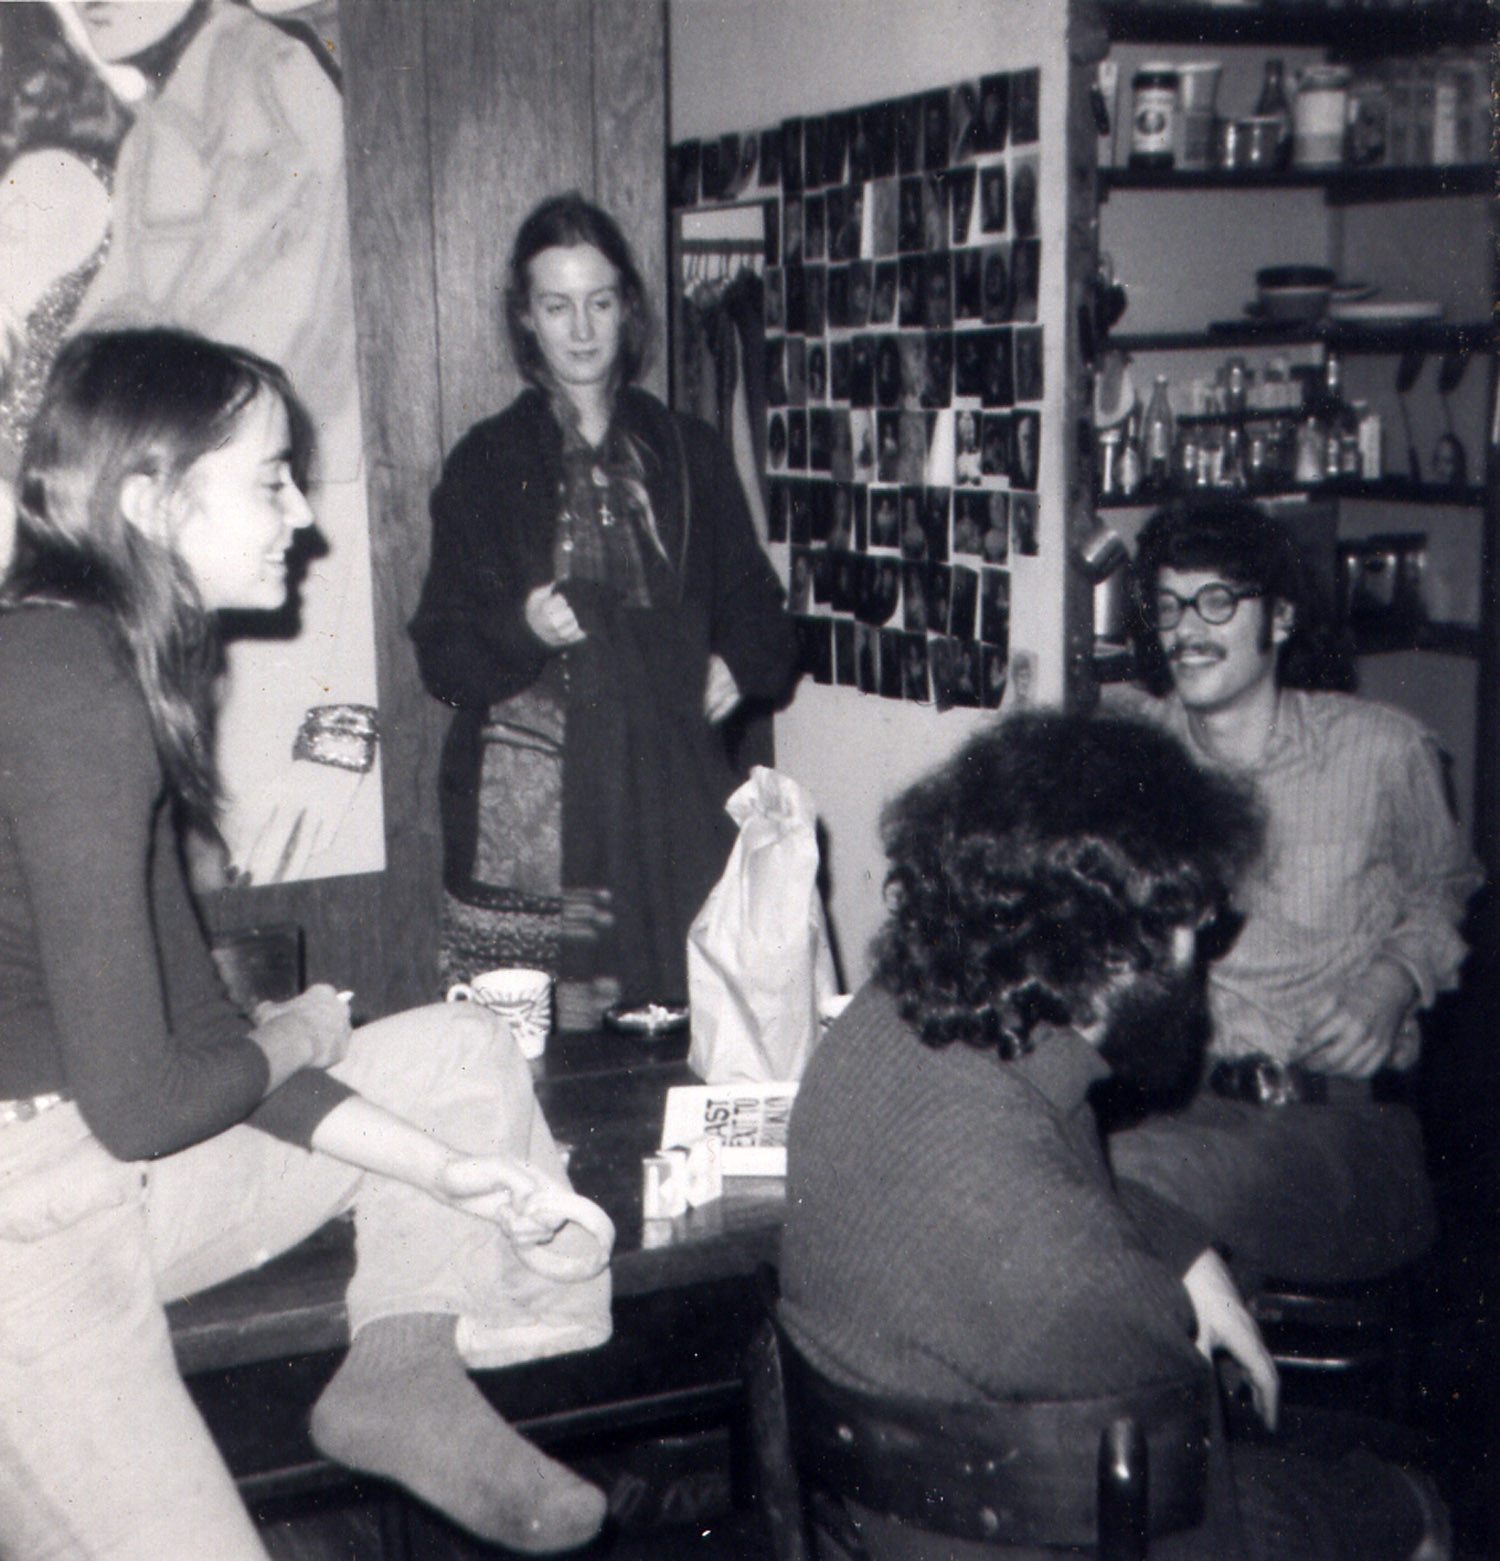 Lee Milman, Heidi Carter, Tom and Jeff Milman, c. 1970.